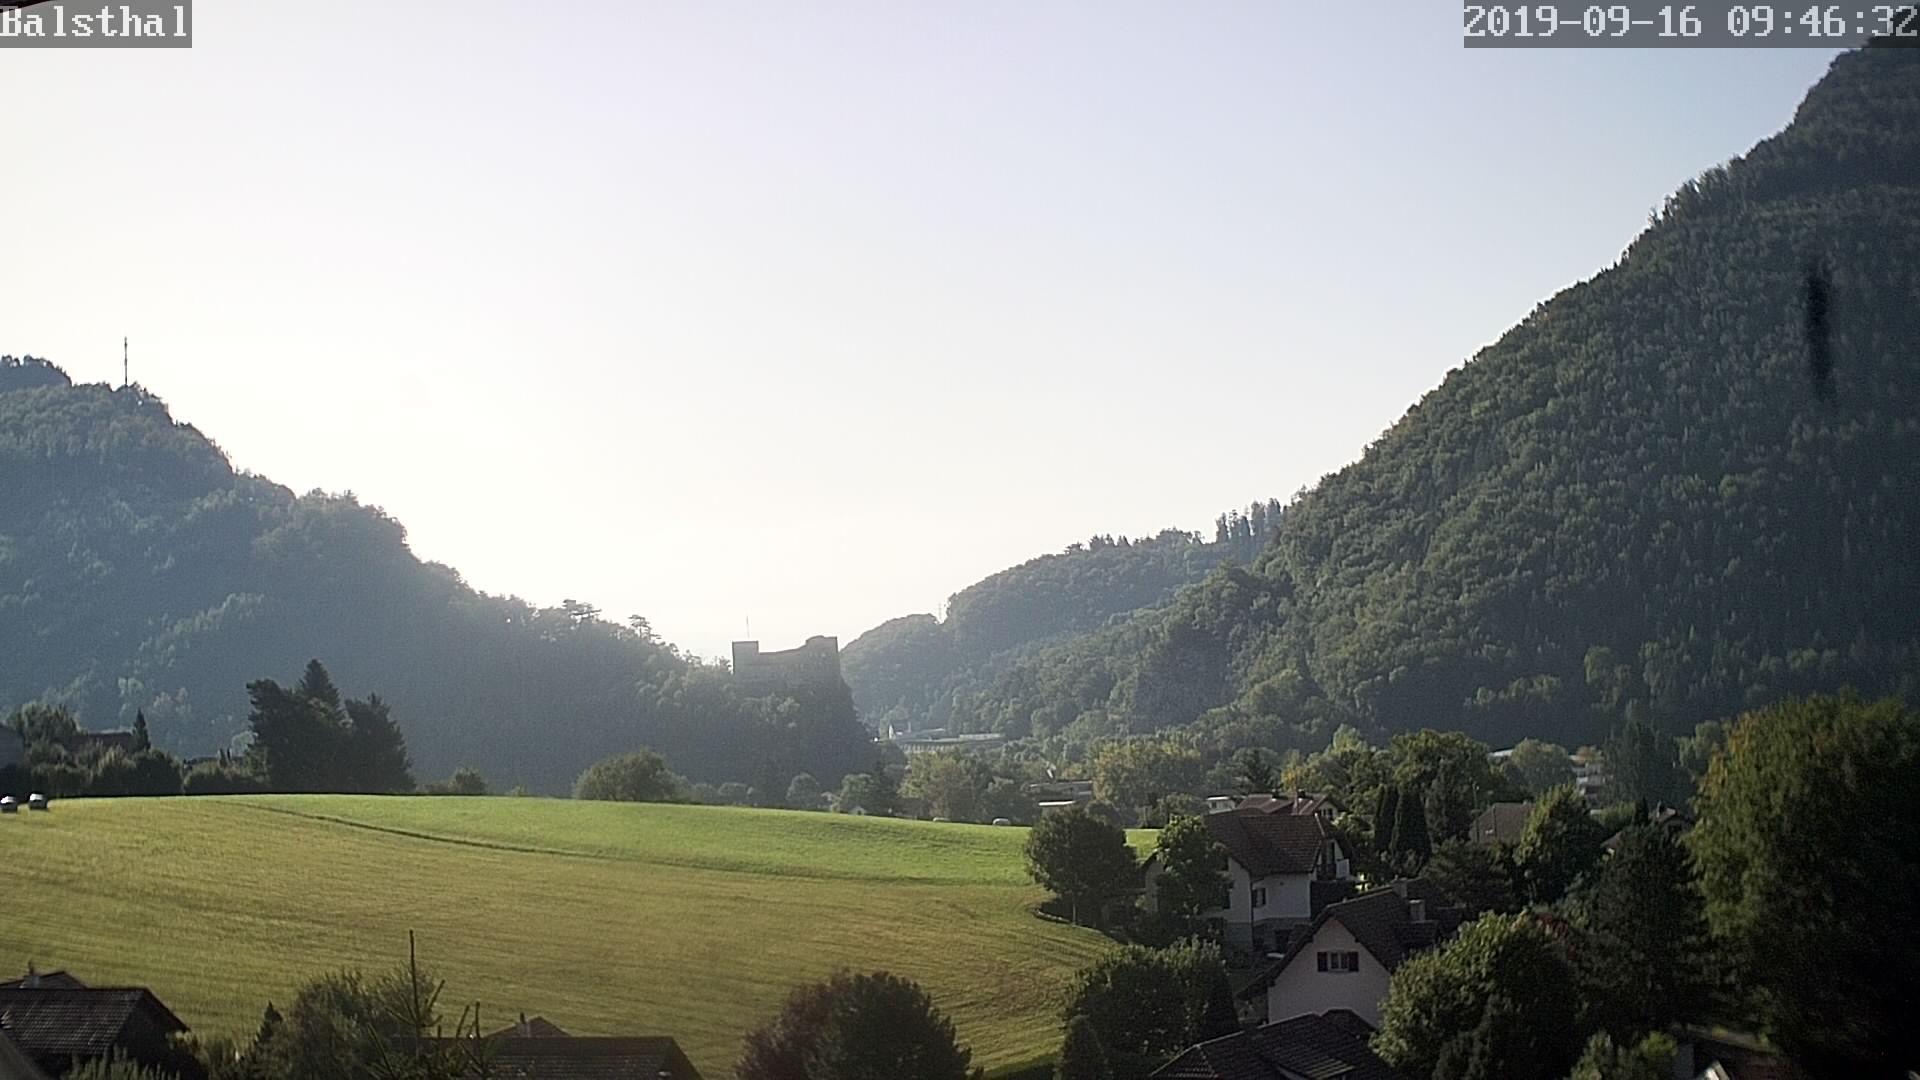 Balsthal › Süd: Museum Alt-Falkenstein